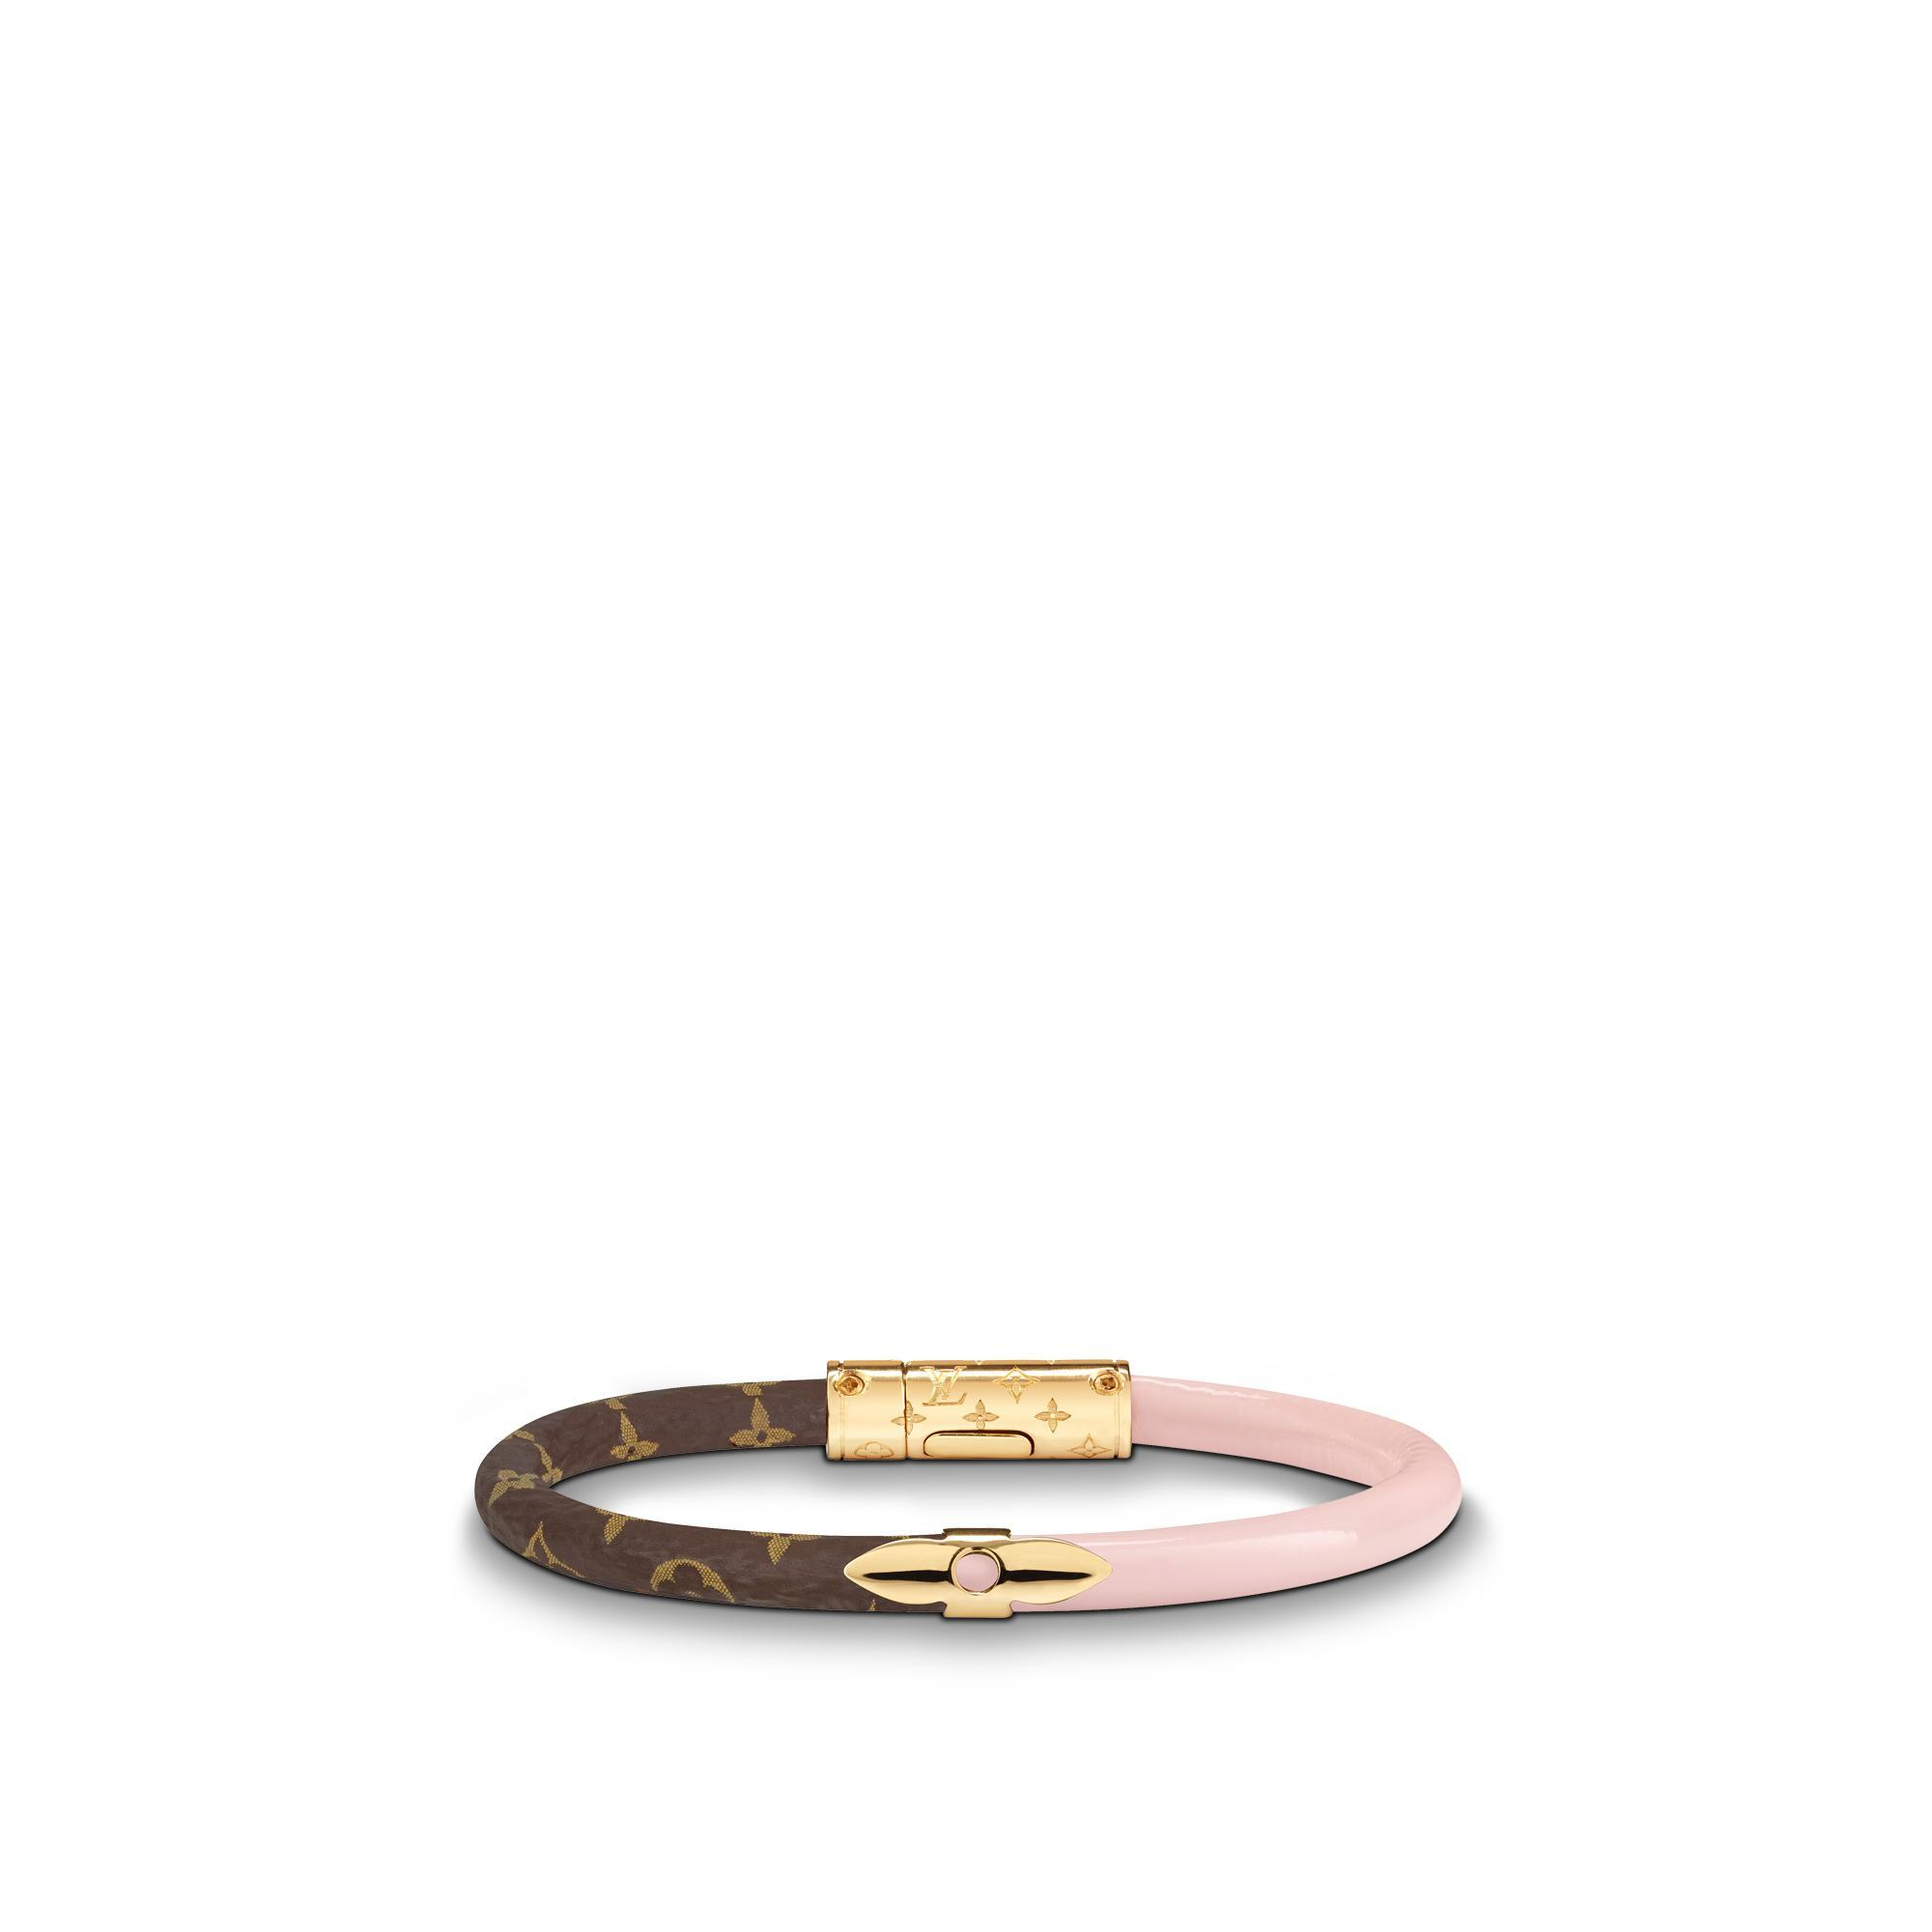 Daily Confidential Bracelet